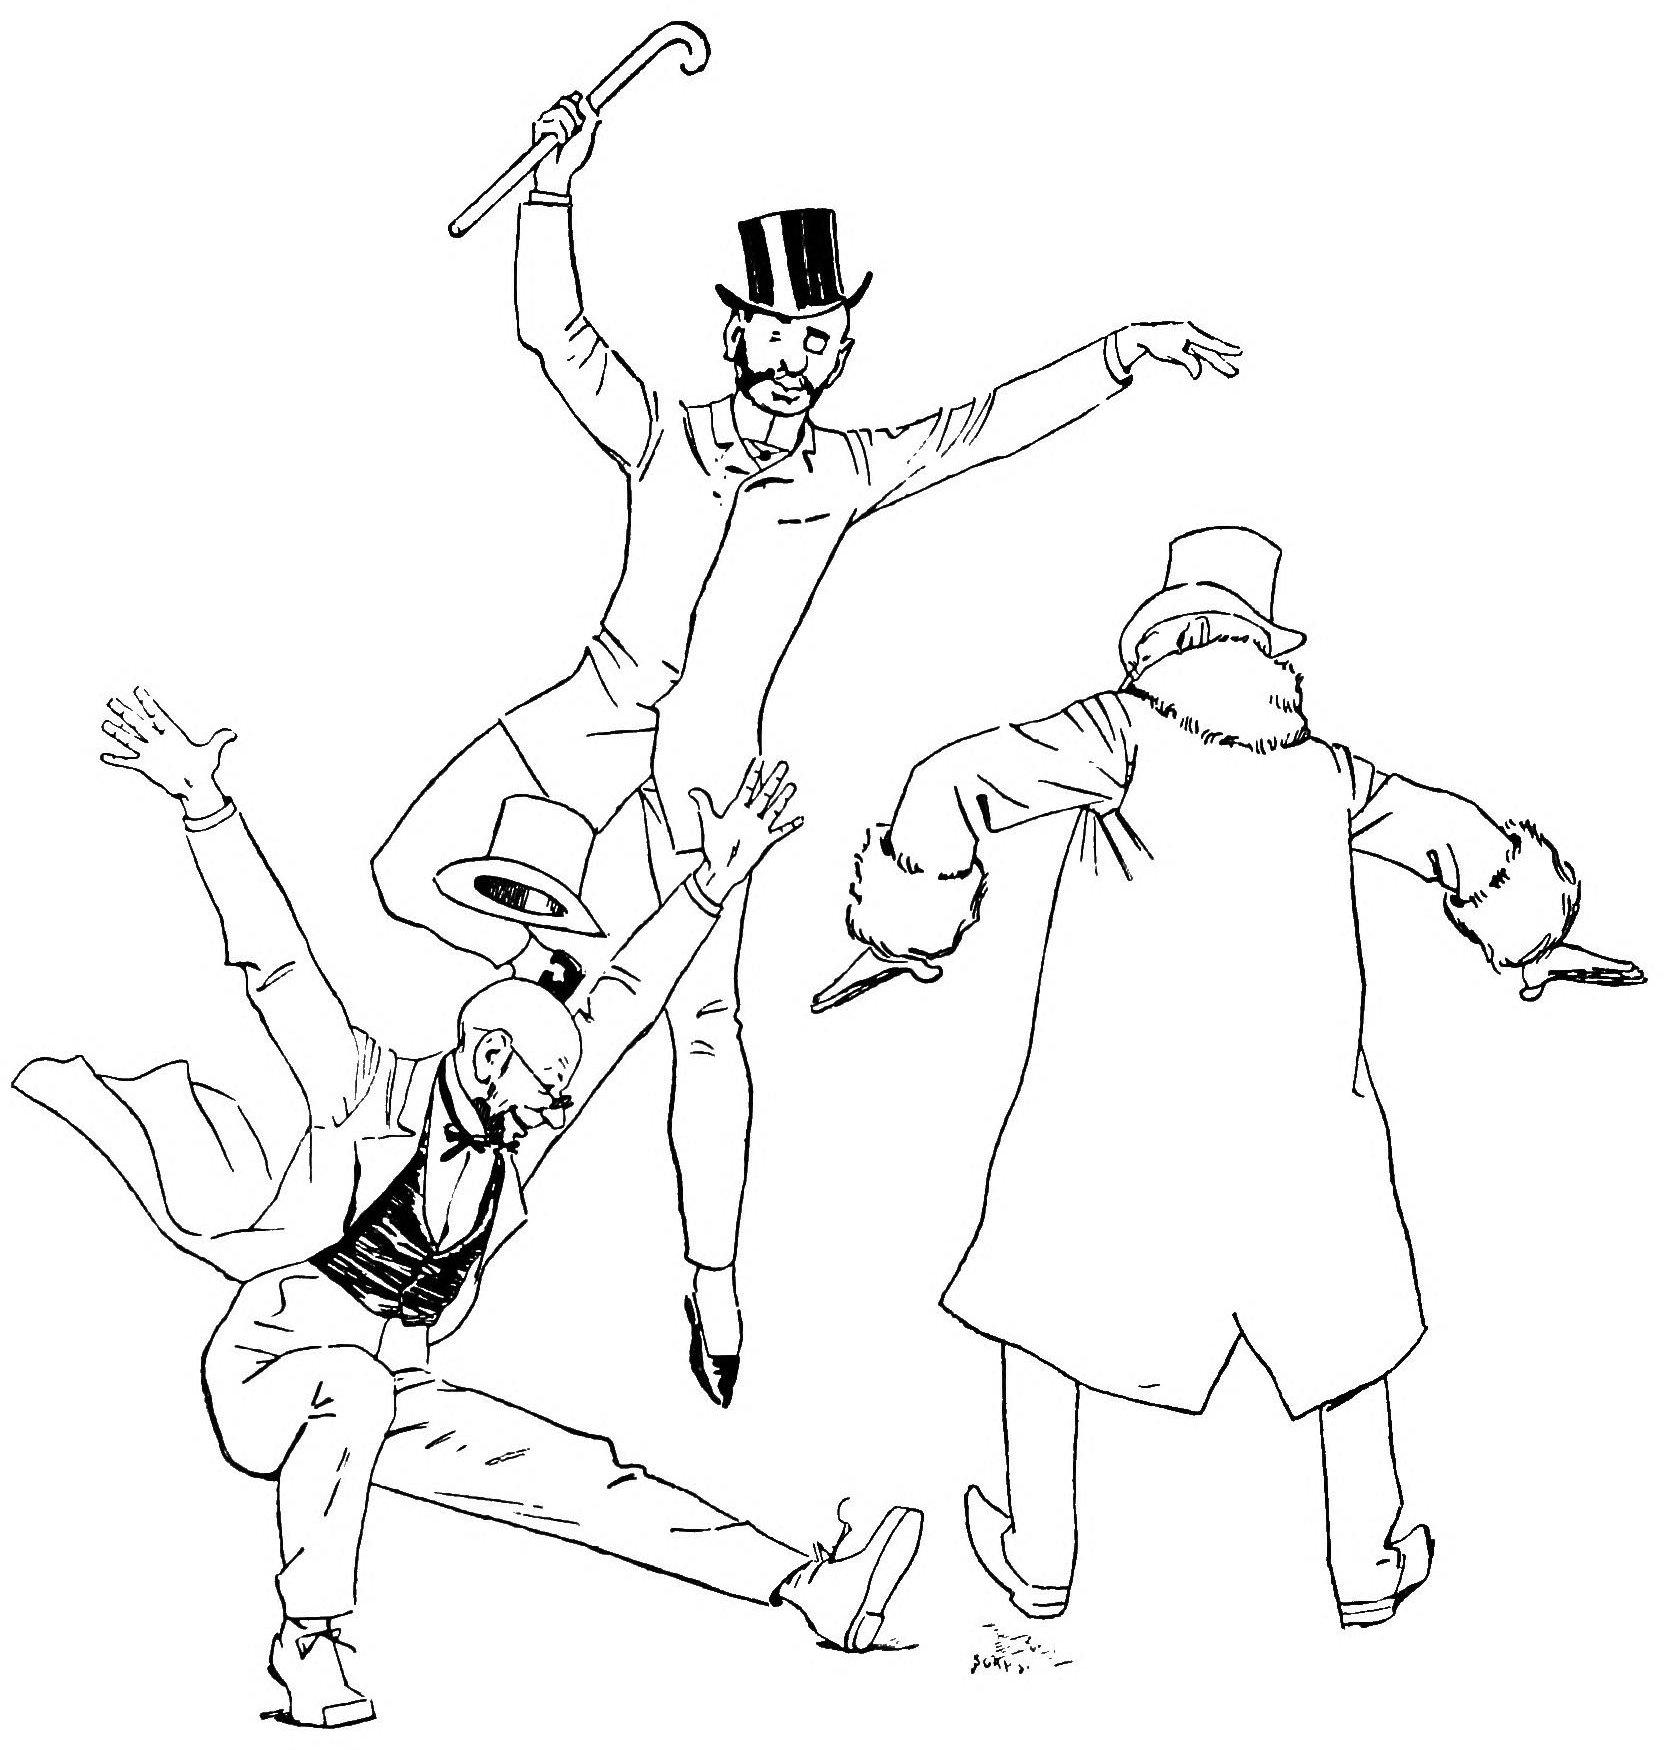 http://upload.wikimedia.org/wikipedia/commons/4/4a/Henri_Gerbault_-_Les_financiers_exprimant_leur_joie.jpg